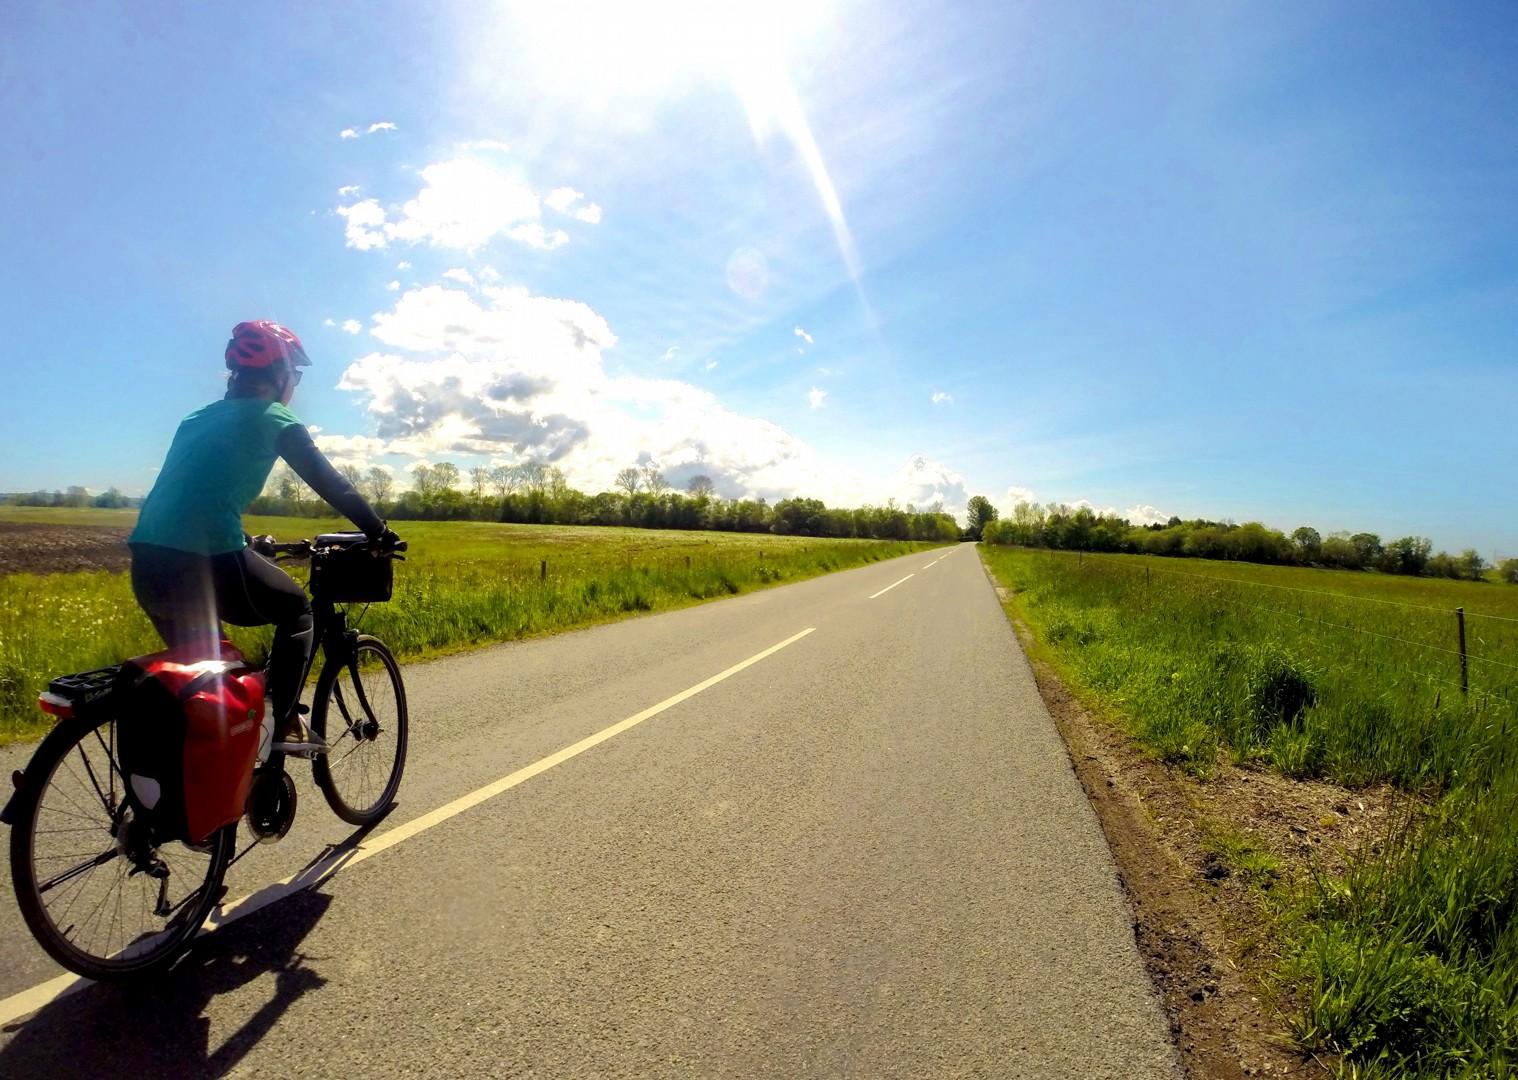 leisure-cycling-holiday-denmark-countryside-experience.jpg - Denmark - Coast, Castles and Copenhagen - Self-Guided Leisure Cycling Holiday - Leisure Cycling